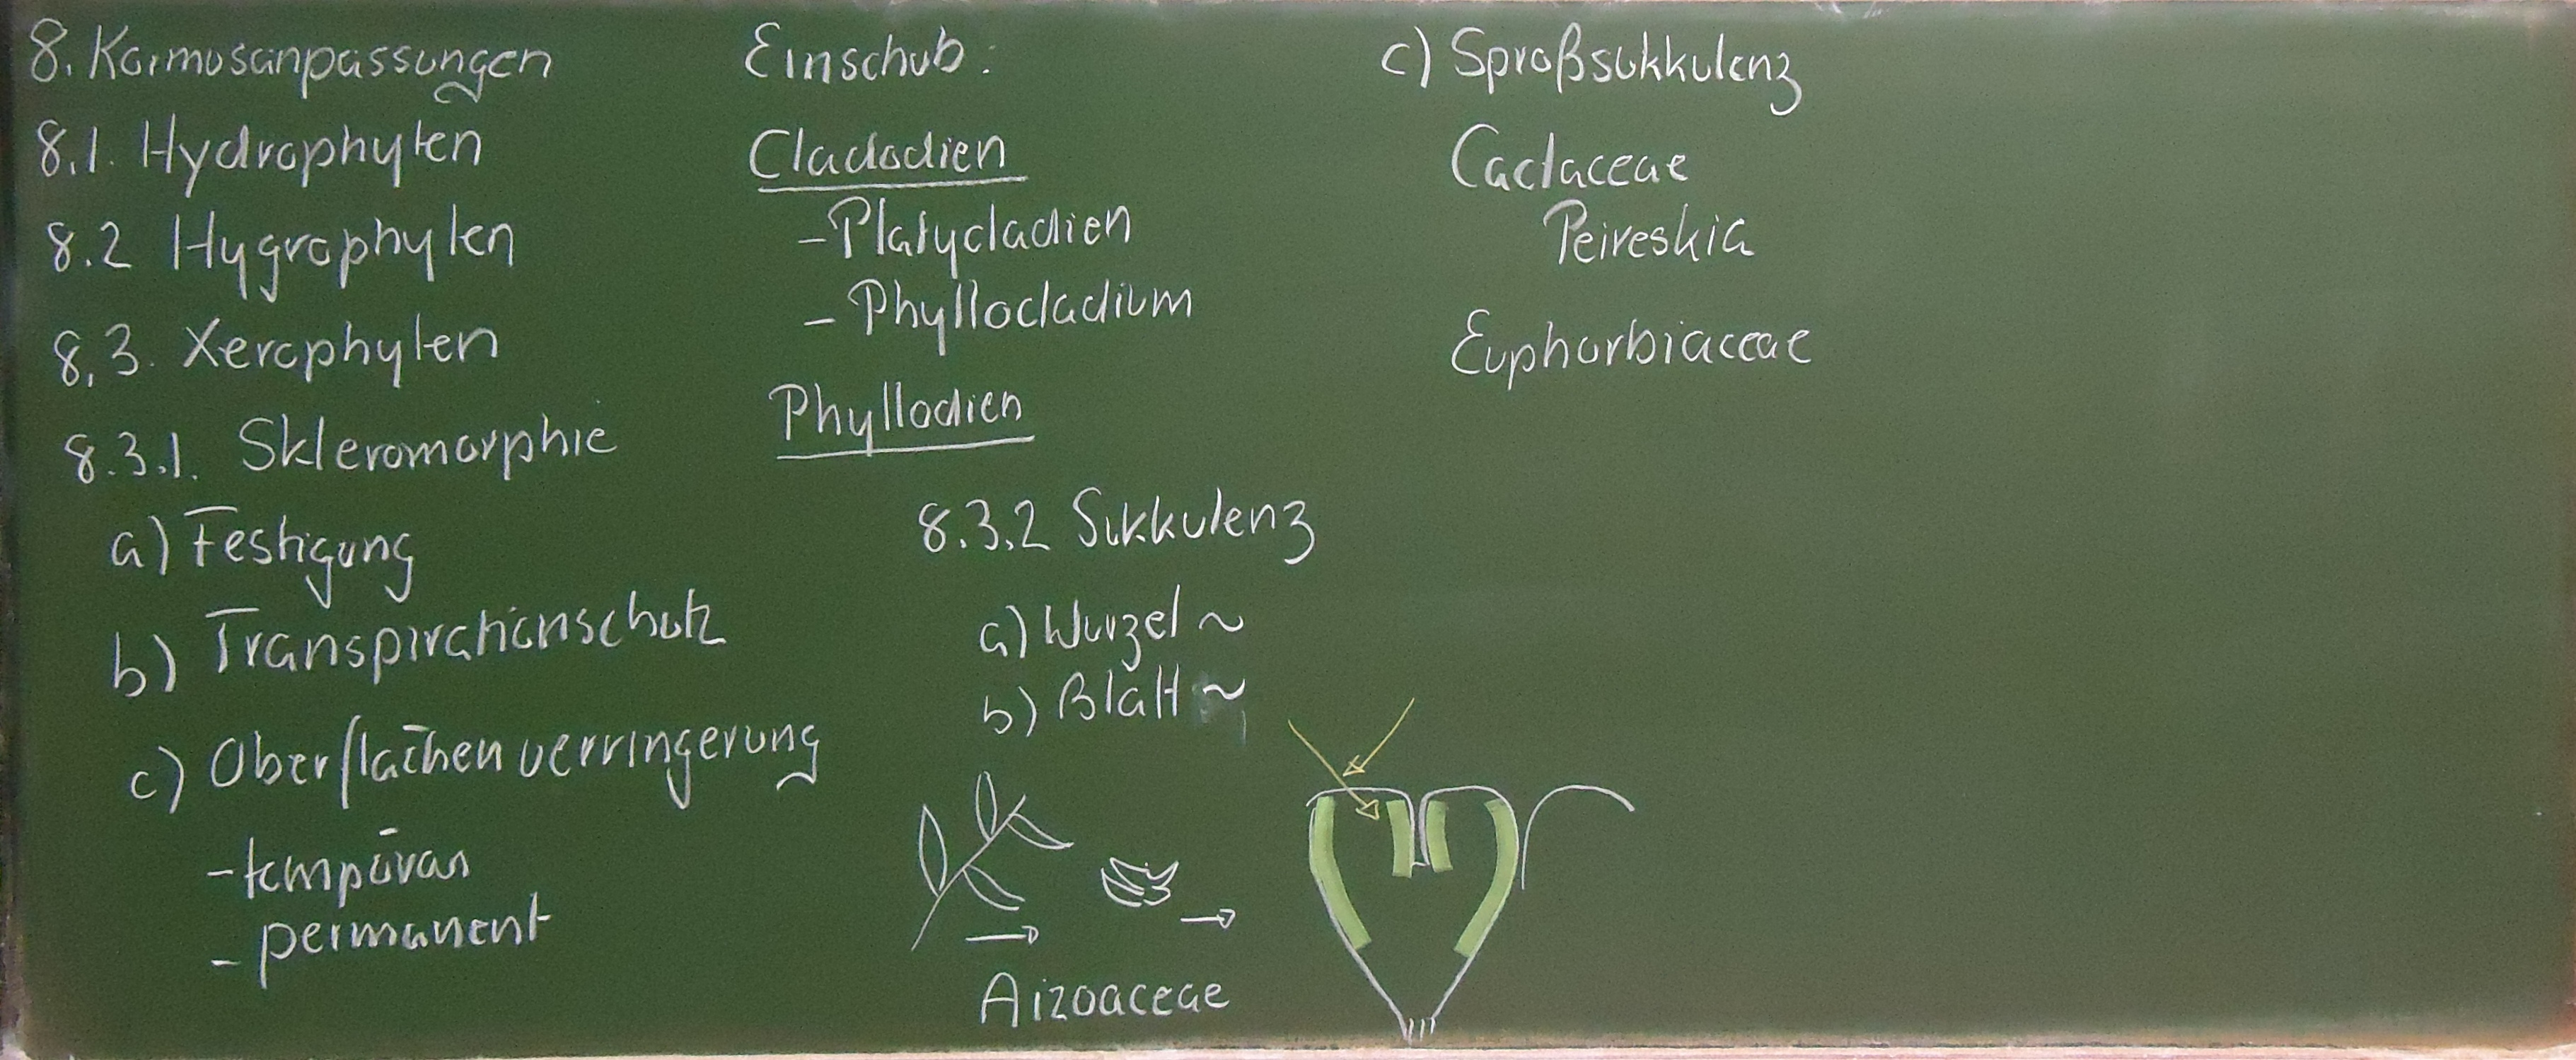 8. Kormusanpassungen - Ulm University